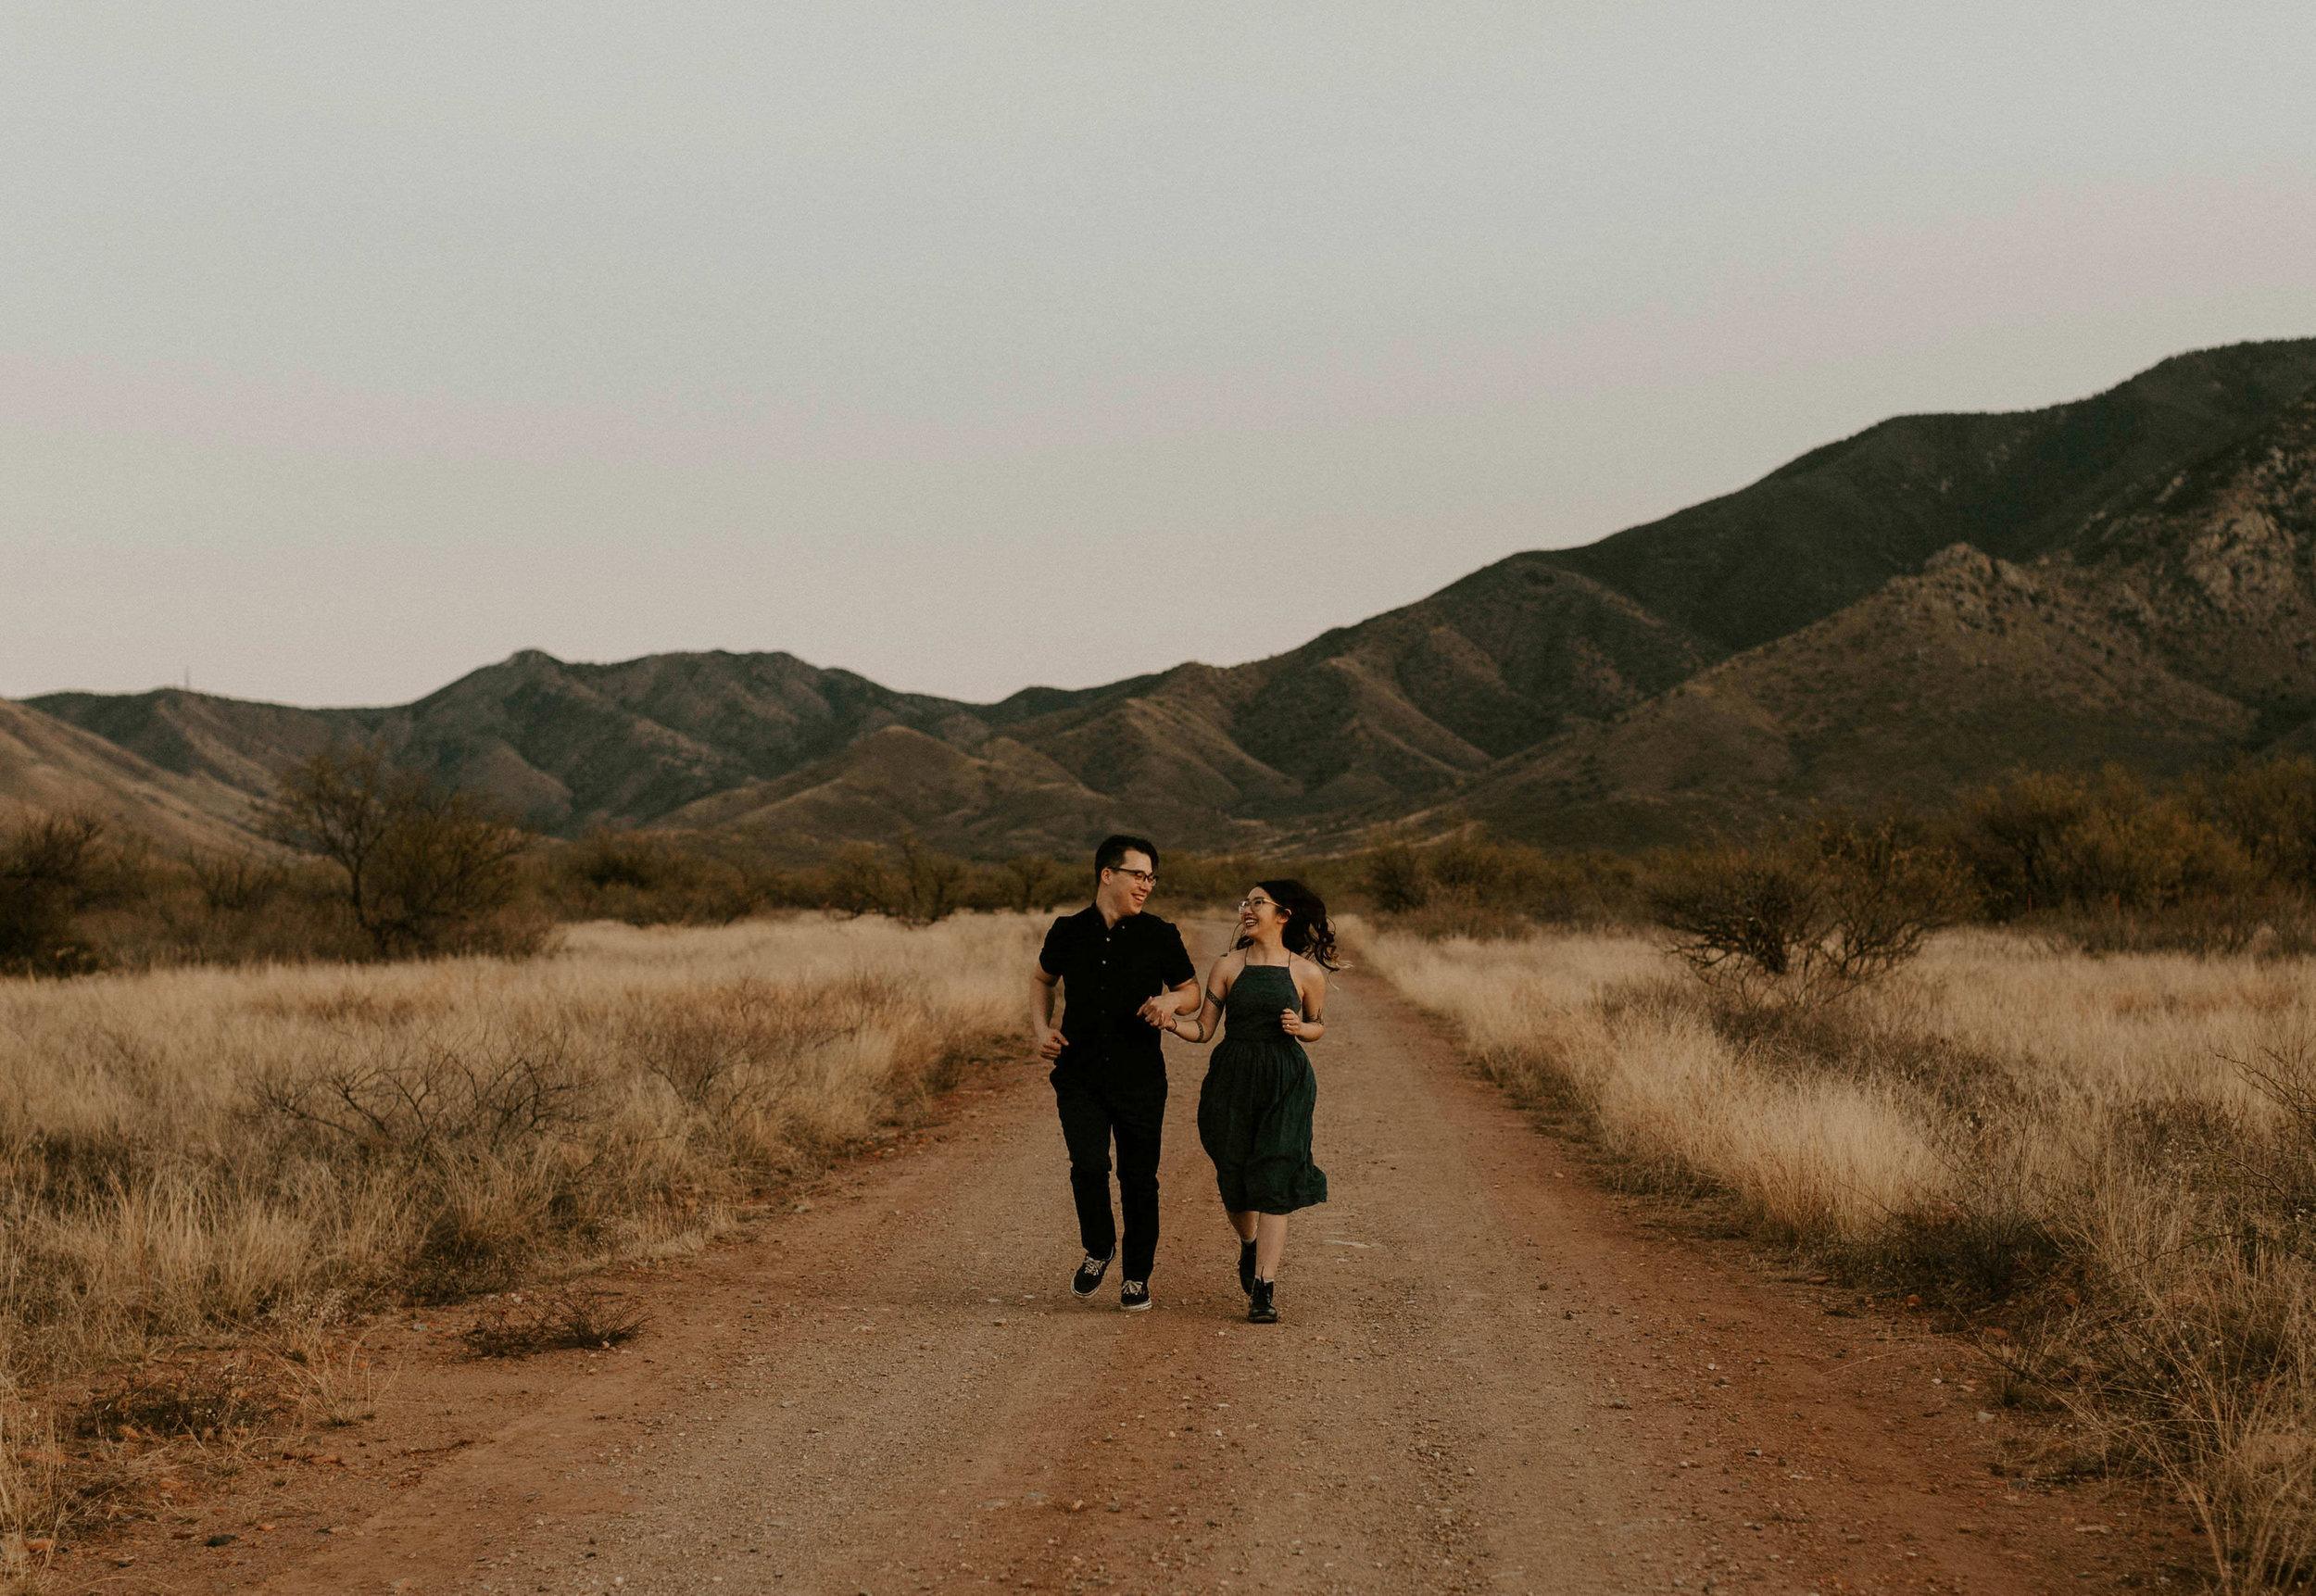 Engagement Session at Madera Canyon in Tucson, Arizona